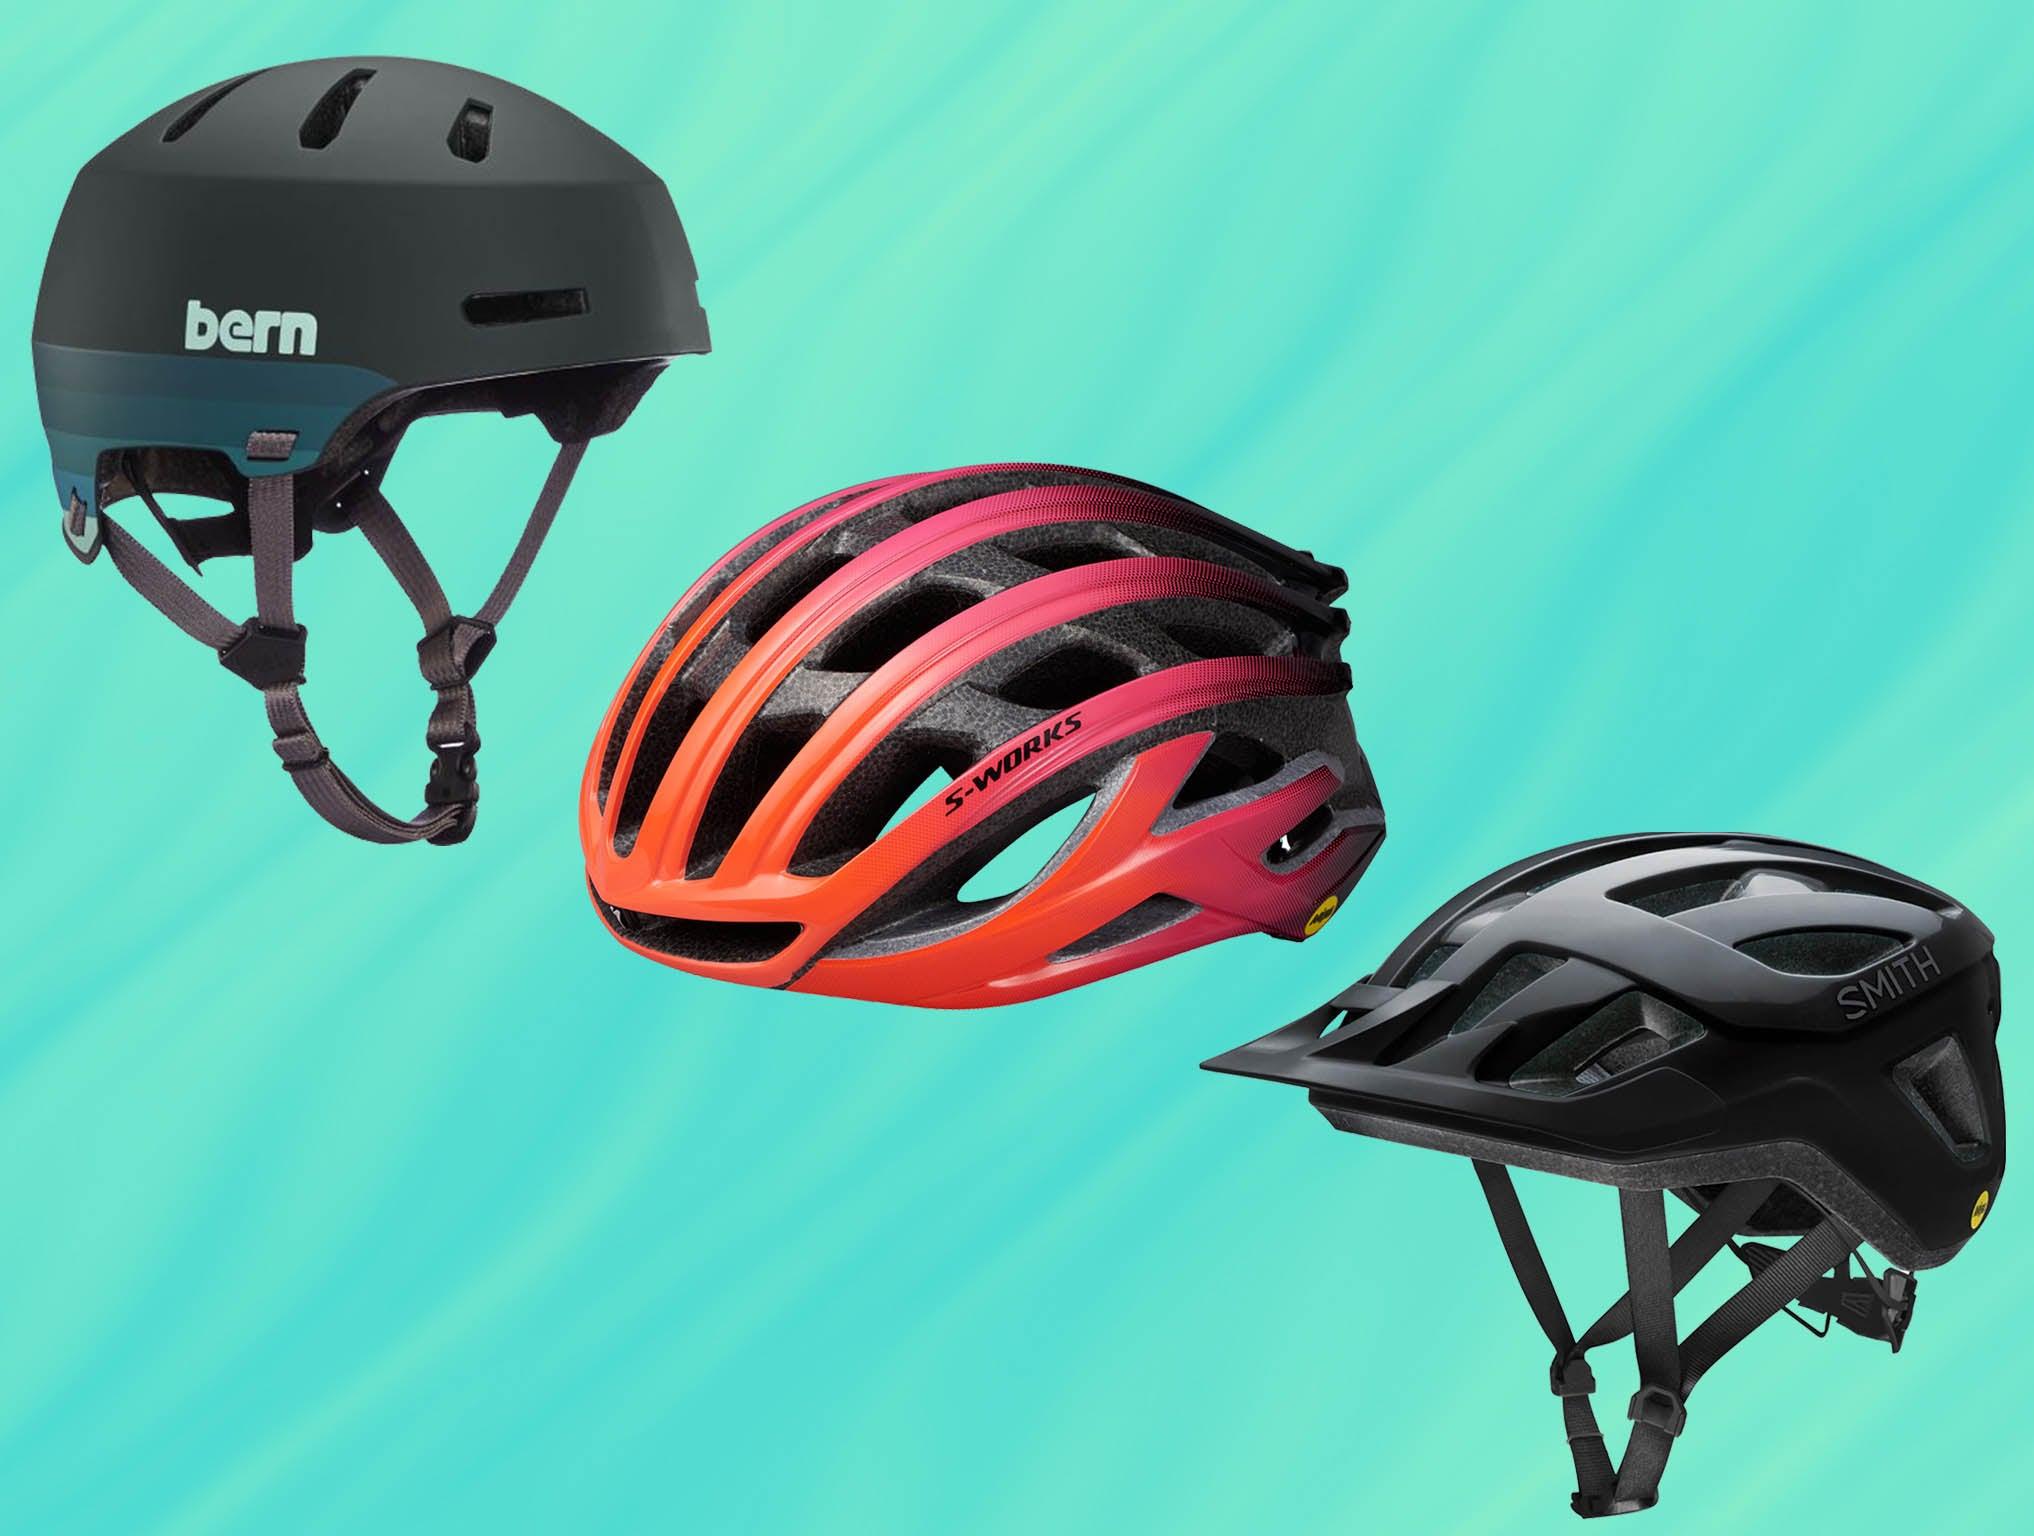 Buyers guide to road bike helmets